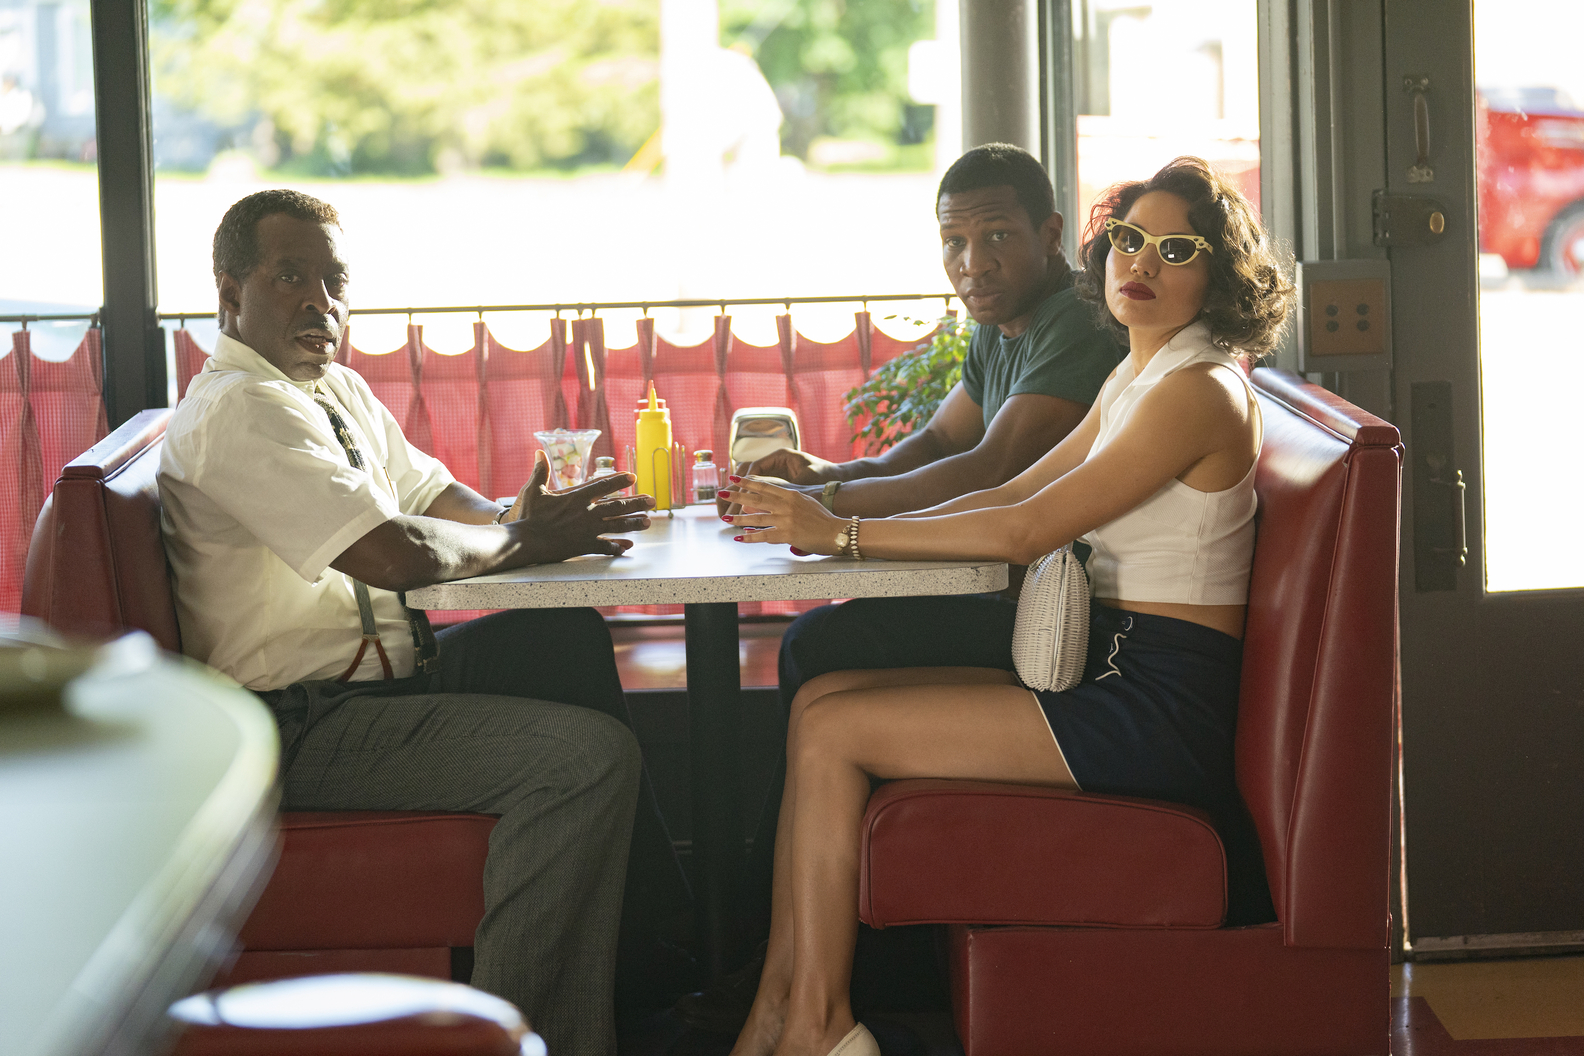 Courtney B. Vance, Jonathan Majors and Jurnee Smollett in 'Lovecraft Country'